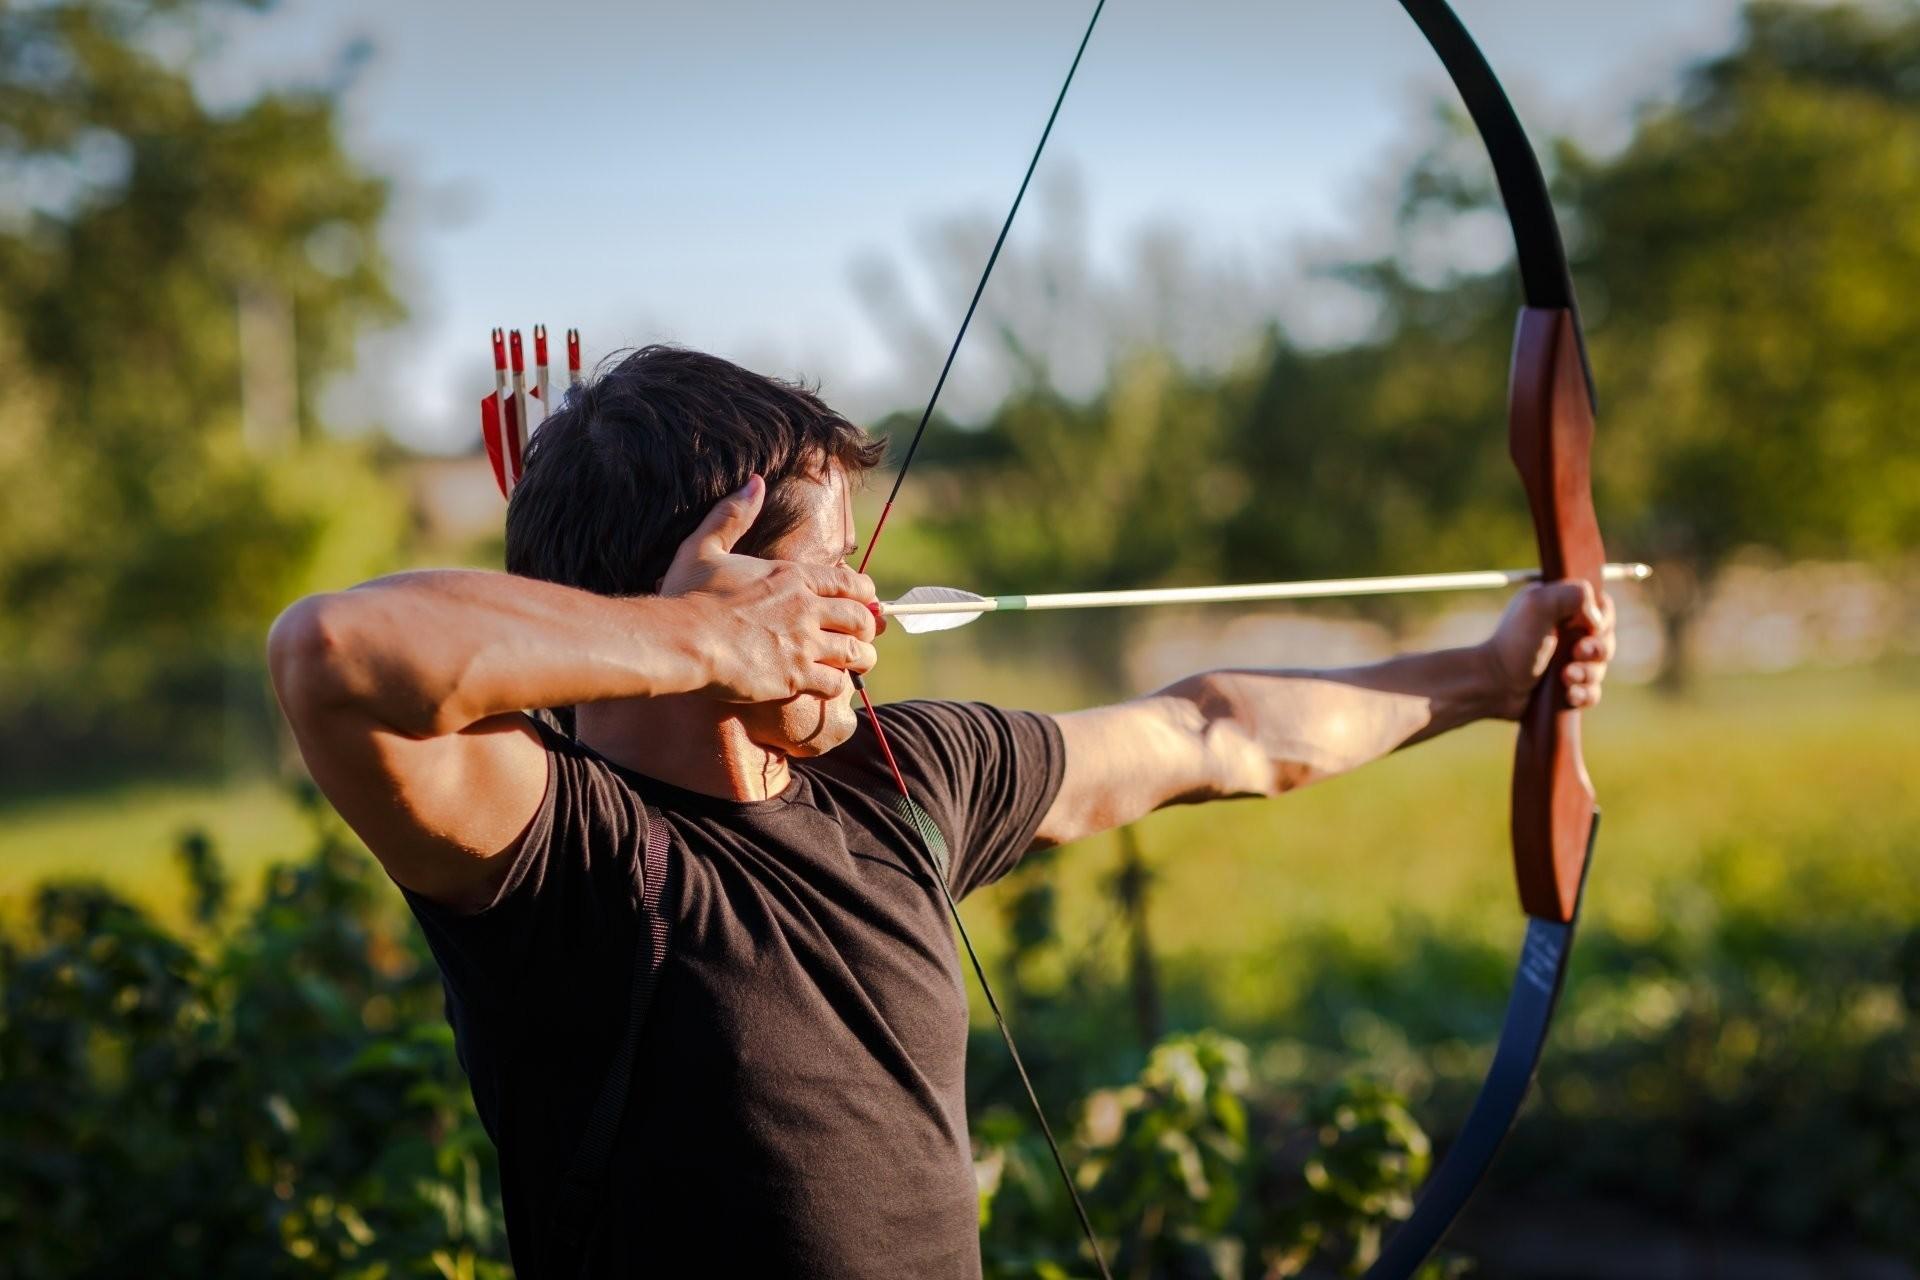 Res: 1920x1280, Title : archery bow arrow pointing man hd wallpaper. Dimension : 1920 x  1280. File Type : JPG/JPEG